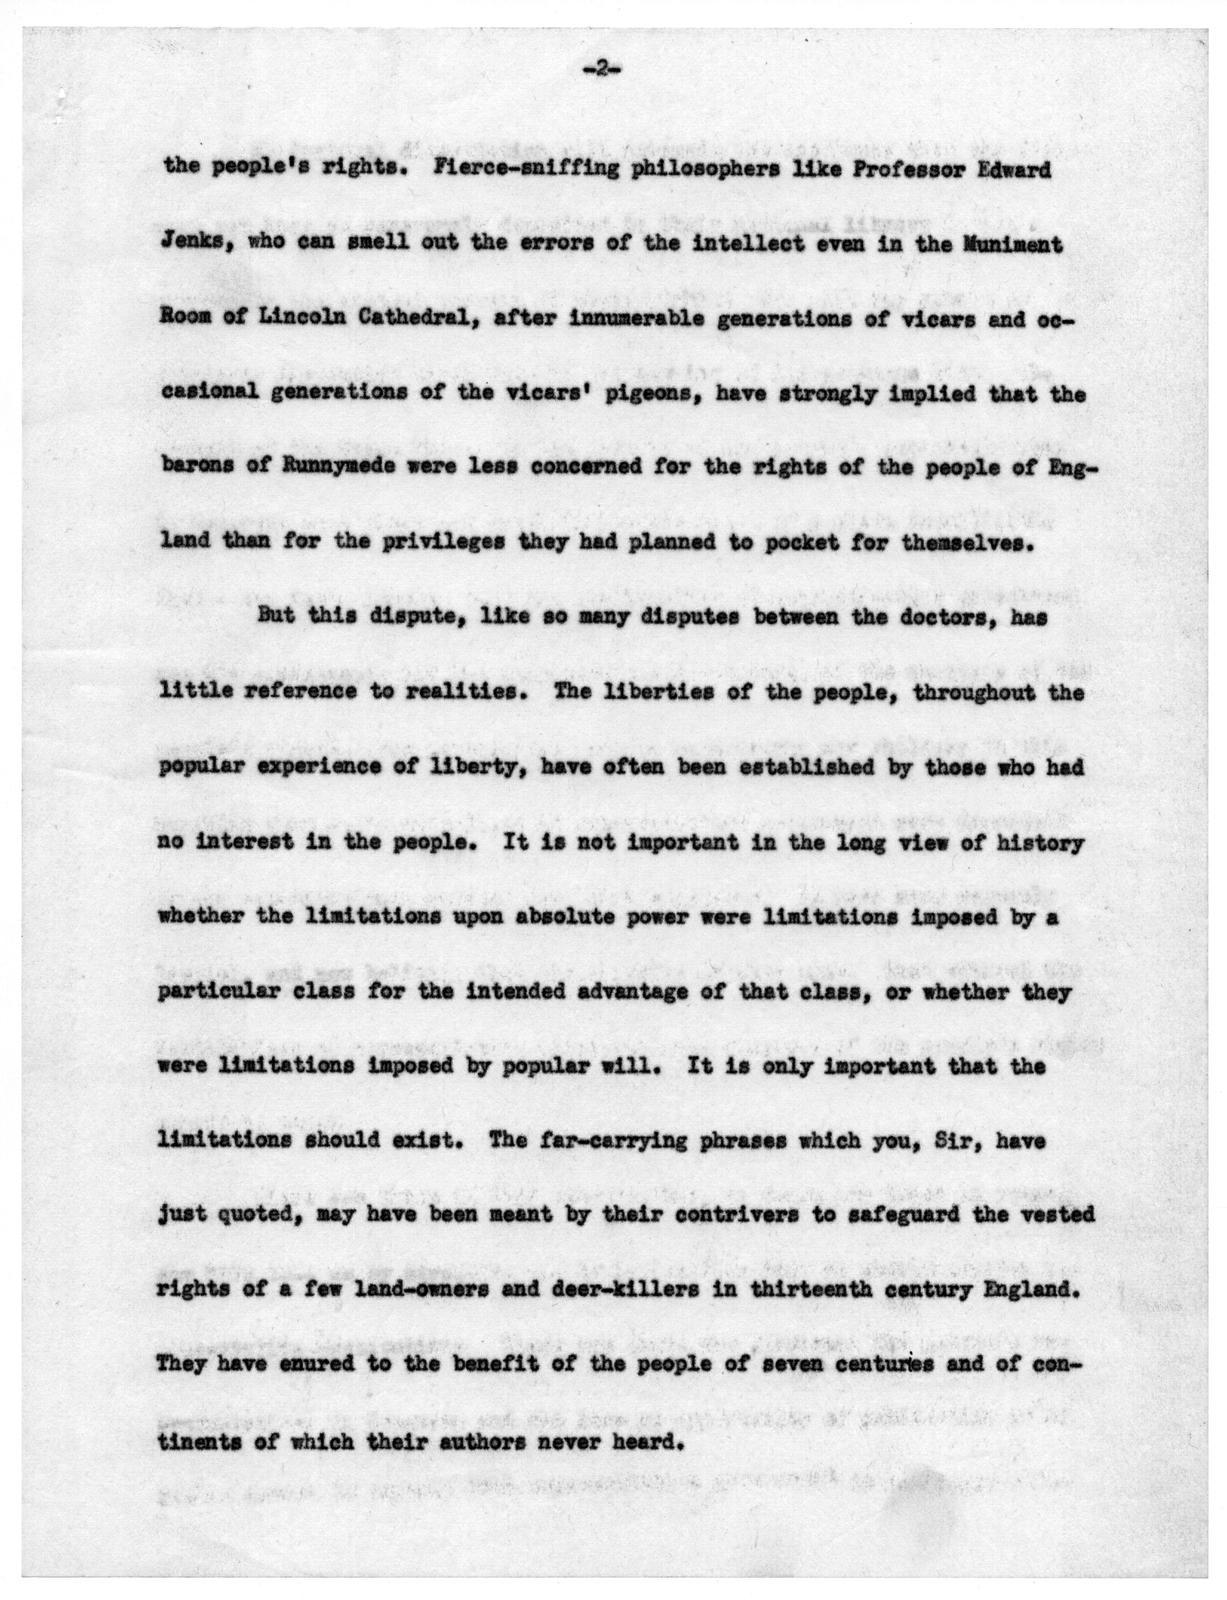 """Deposit of the Magna Carta,"" by Archibald MacLeish, November 28, 1939"